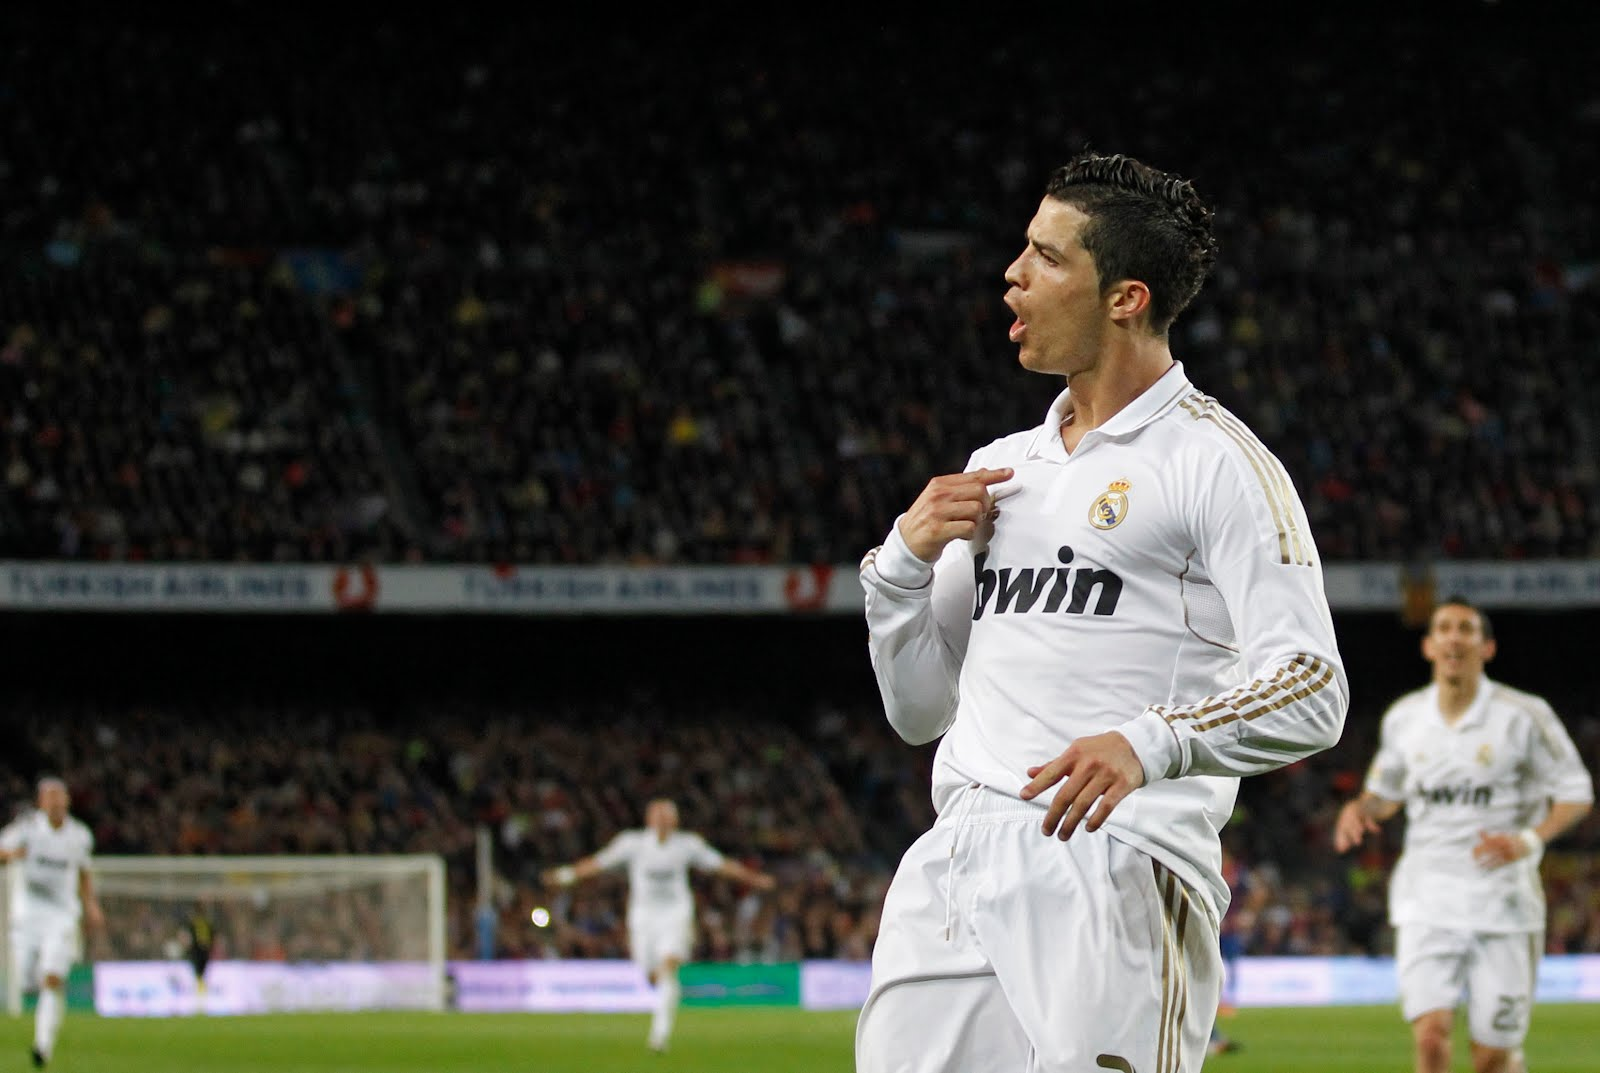 http://3.bp.blogspot.com/-nev-HfNOS8k/T5POl_qas1I/AAAAAAAAAtk/TgudGpgSD8o/s1600/Barca-Real%2BMadrid%2B1-2-Ronaldo-Goal-Celebration.jpg